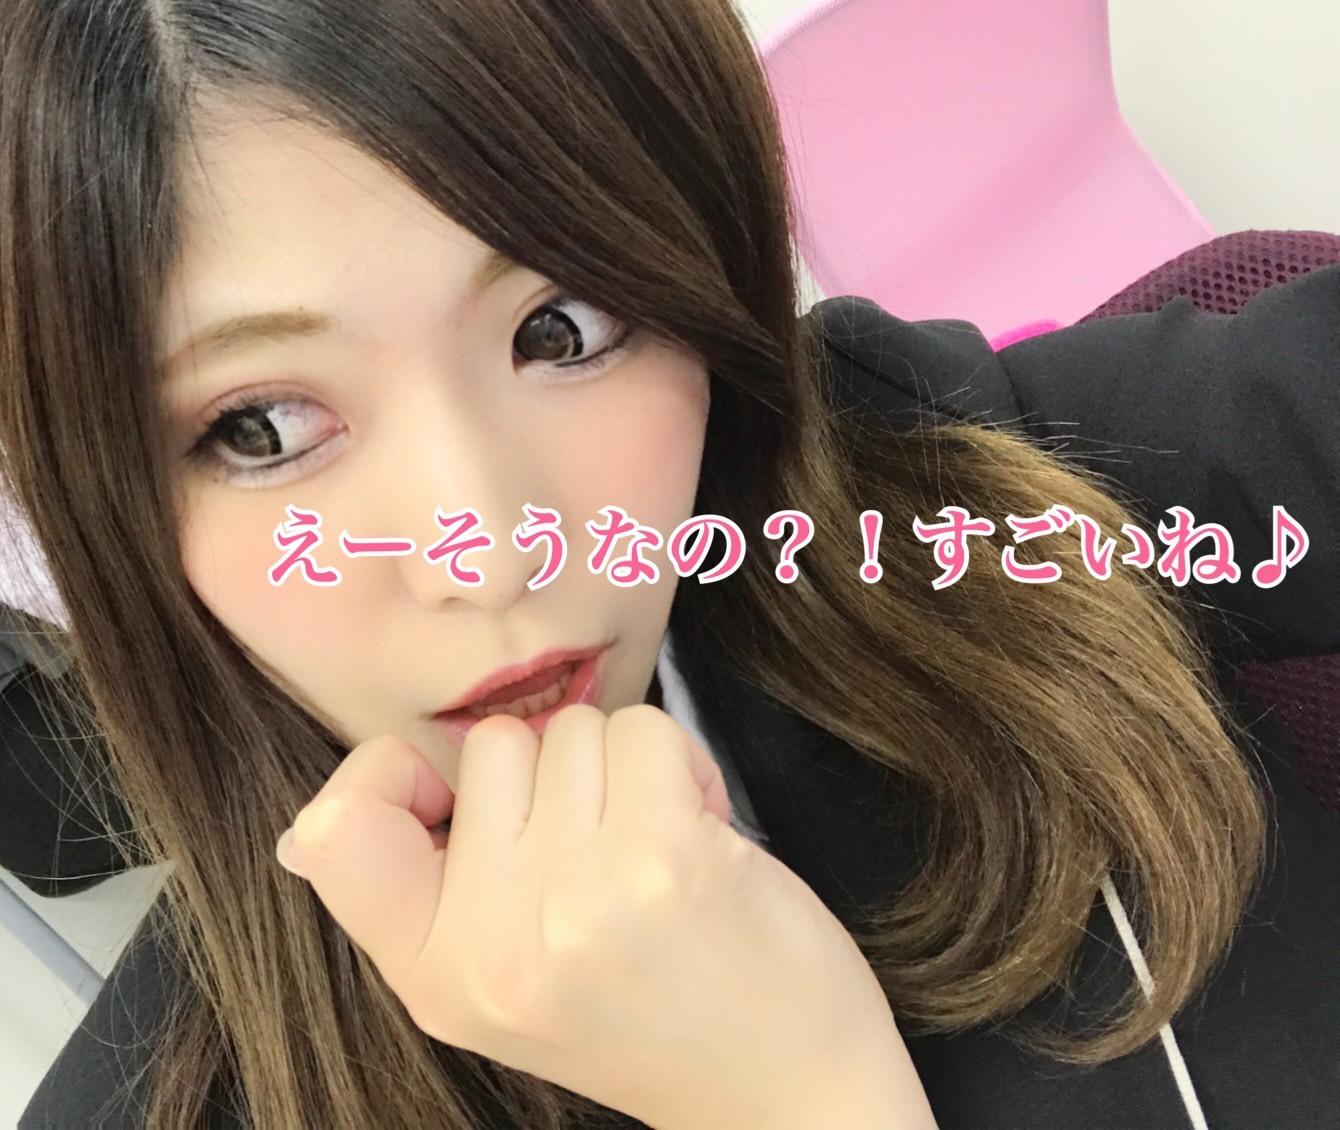 S__7520304.jpg